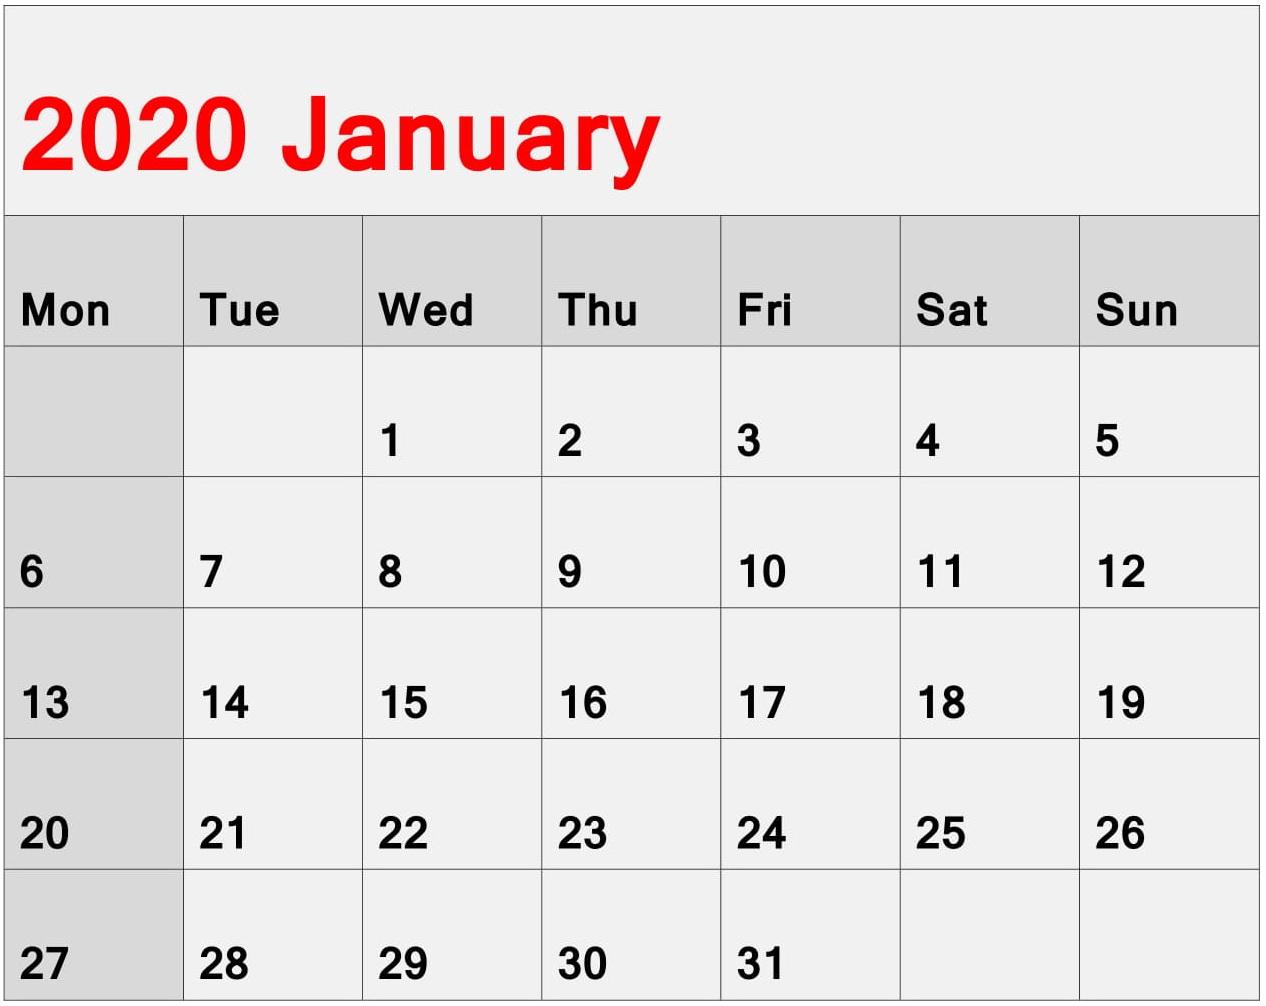 Calendar For January 2020 Excel Format  Latest Printable intended for Jan 2020 Calendar